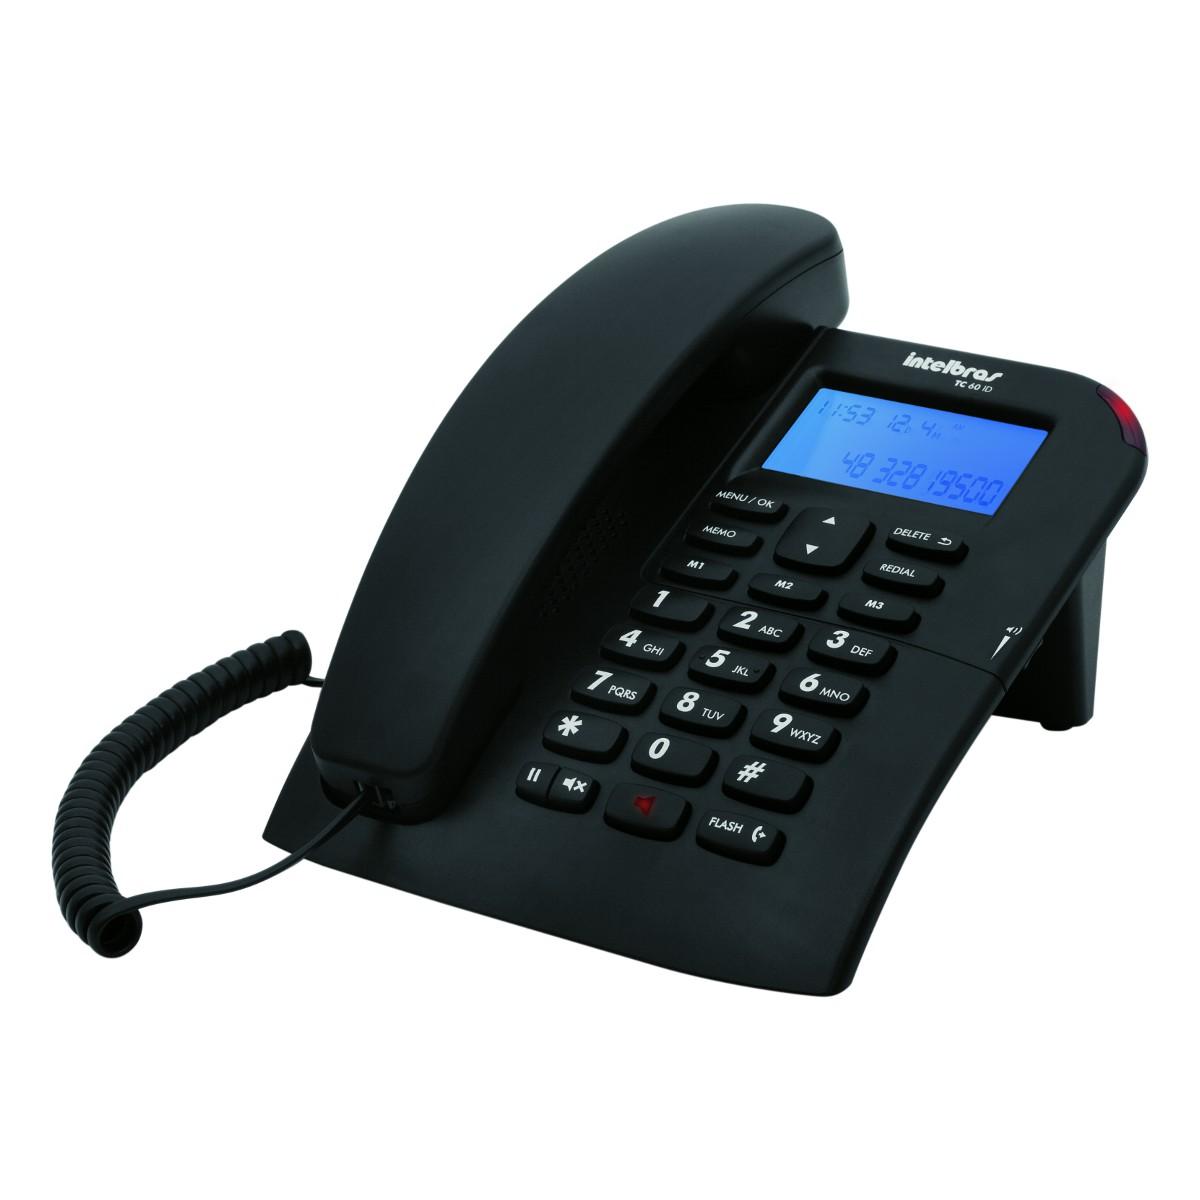 Telefone TC 60 Com ID e Viva - Voz Intelbras